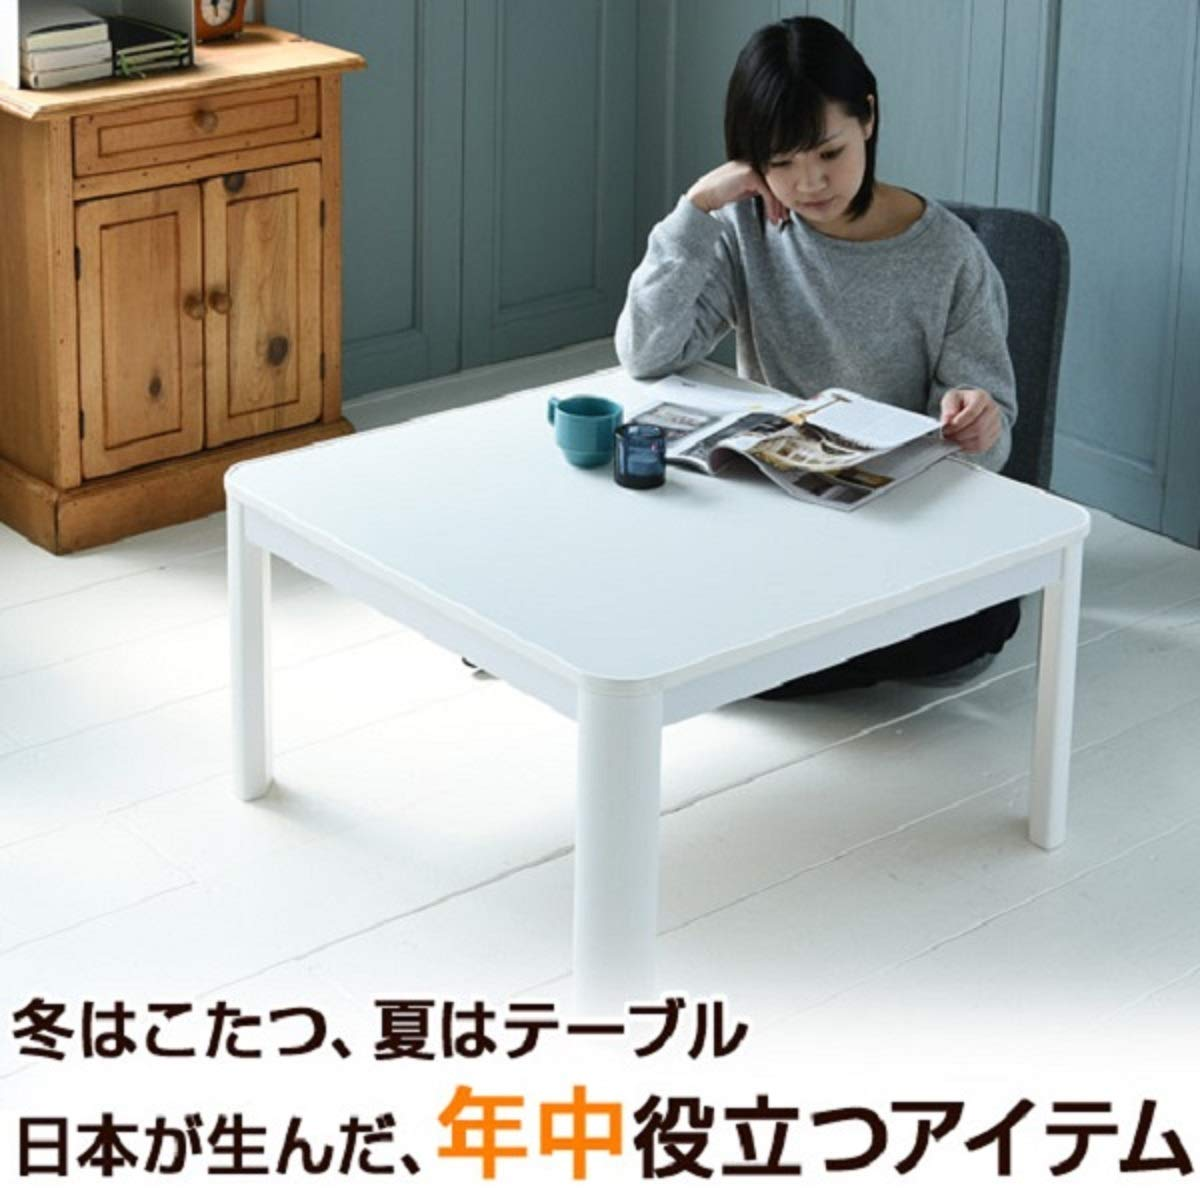 YAMAZEN ESK-751(B) Casual Kotatsu Japanese Heated Table 75x75 cm Black